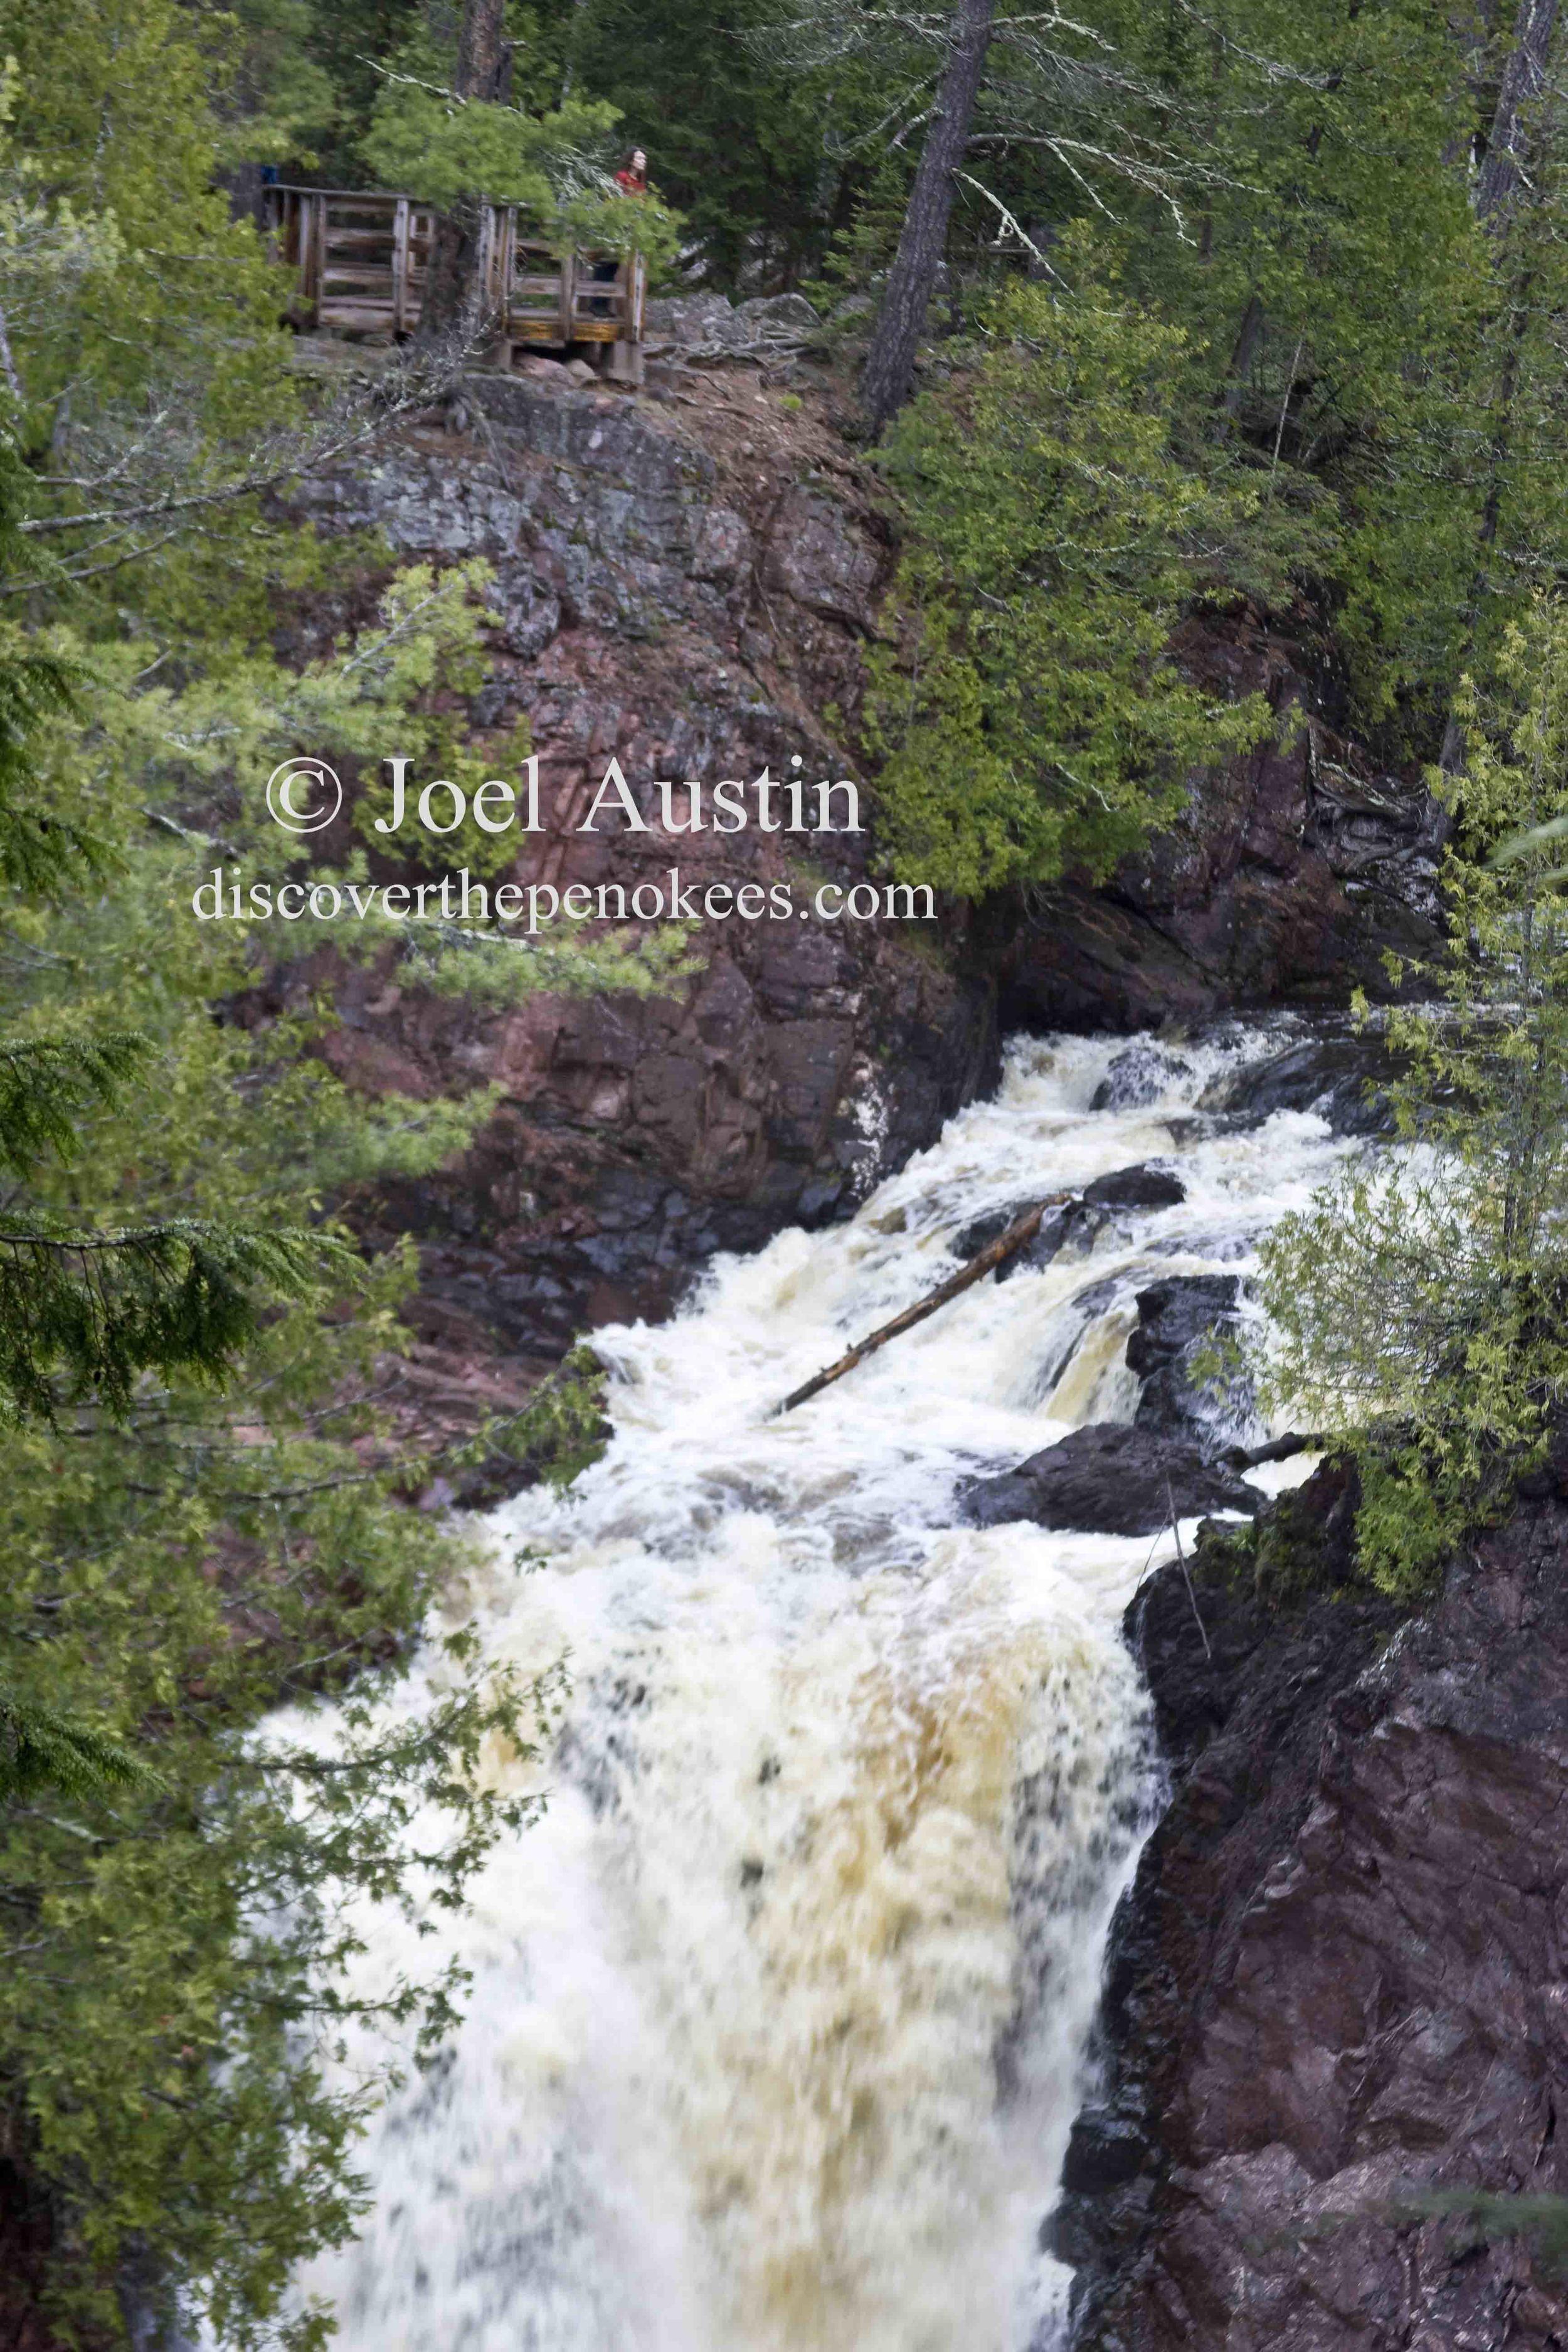 Brownstone Falls in Copper Falls State Park.